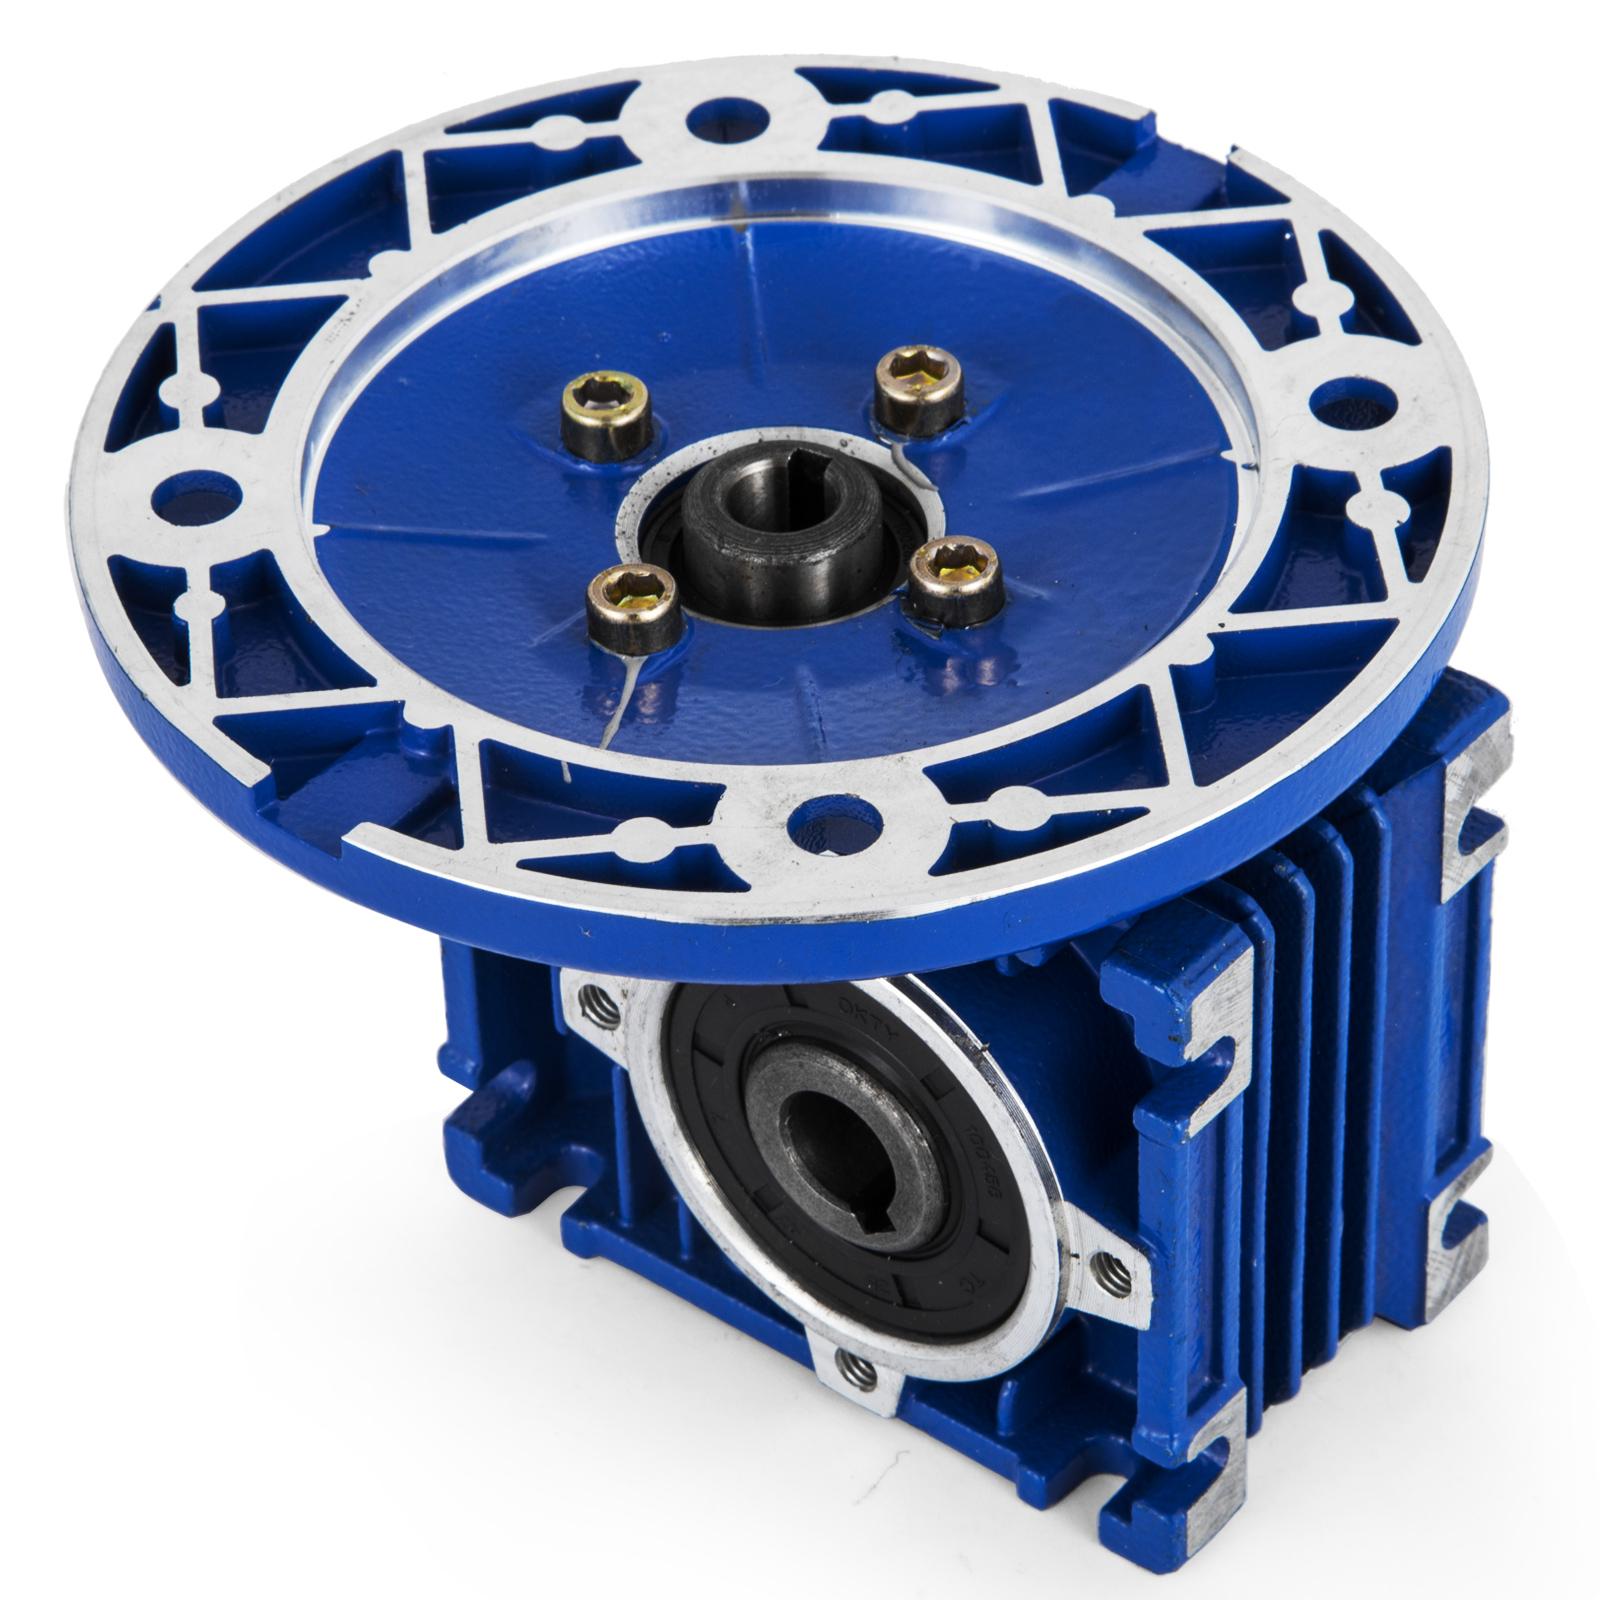 NMRV030 Series Worm Gear 15:1 63c Speed Reducer Smooth 20Cr Cast Aluminum HOT